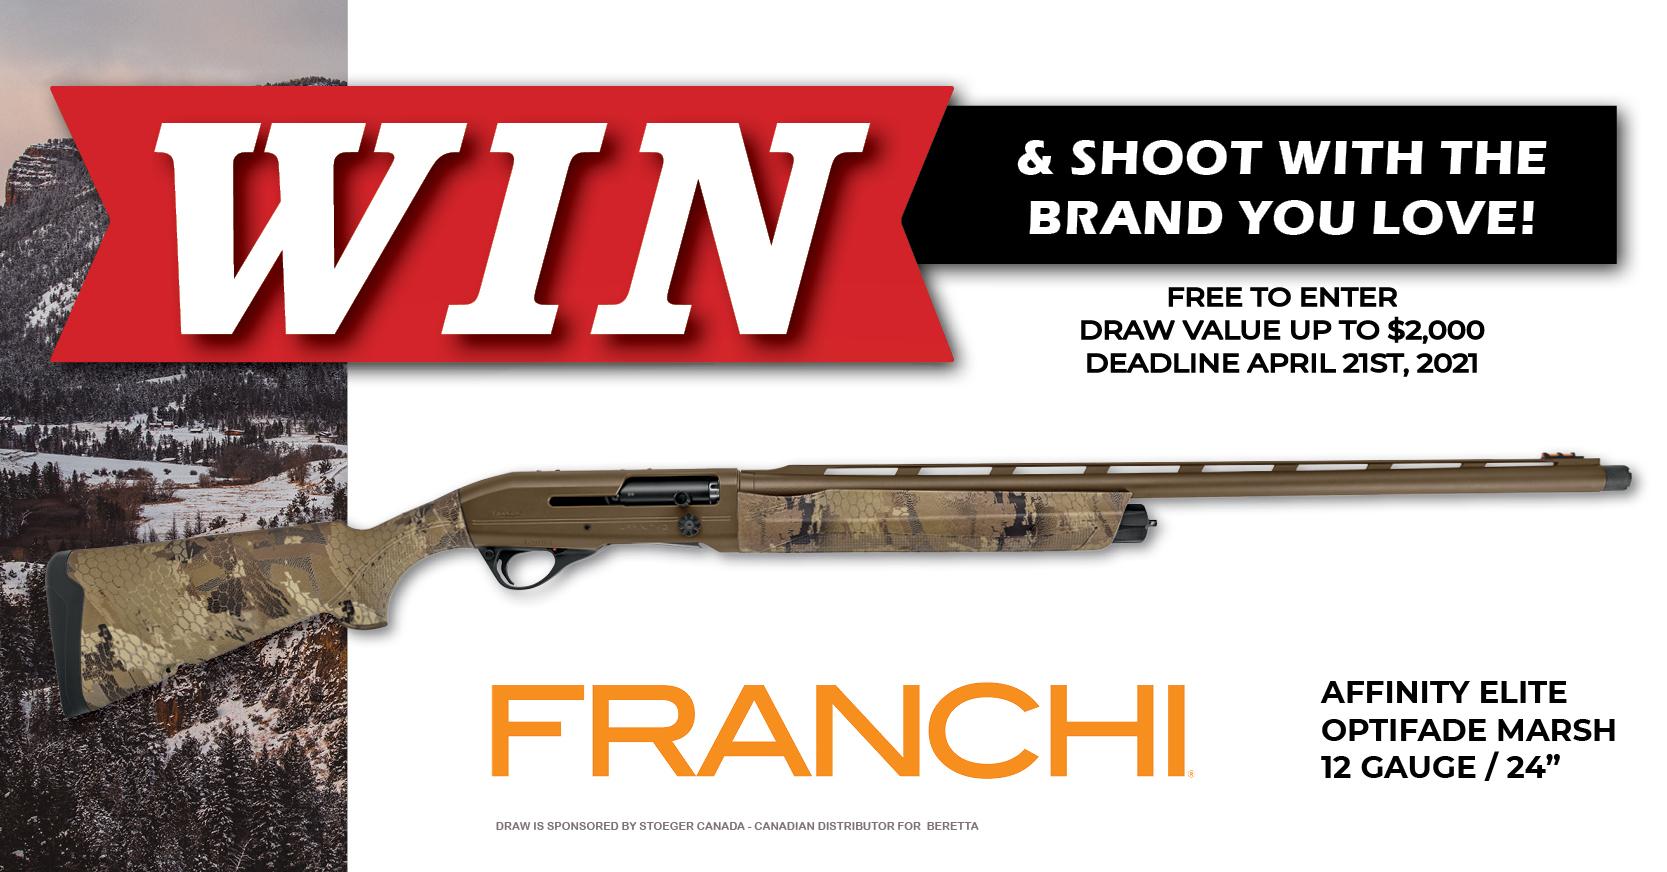 Firearm Draw 2021 FRANCHI Facebook